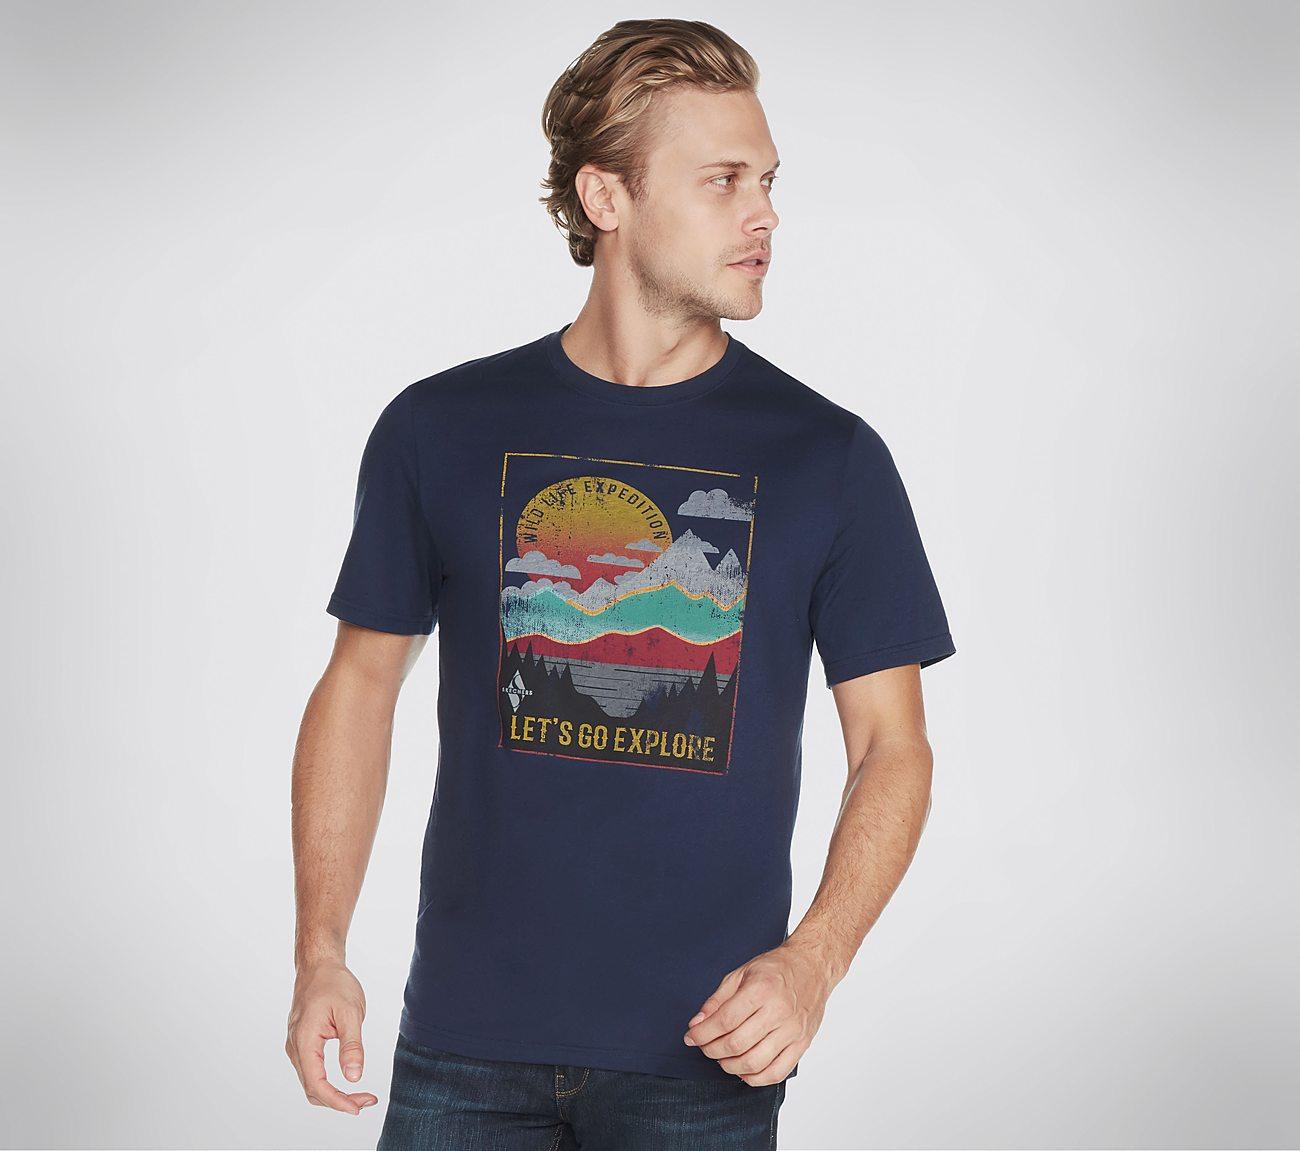 Skechers Apparel Explore Tee Shirt